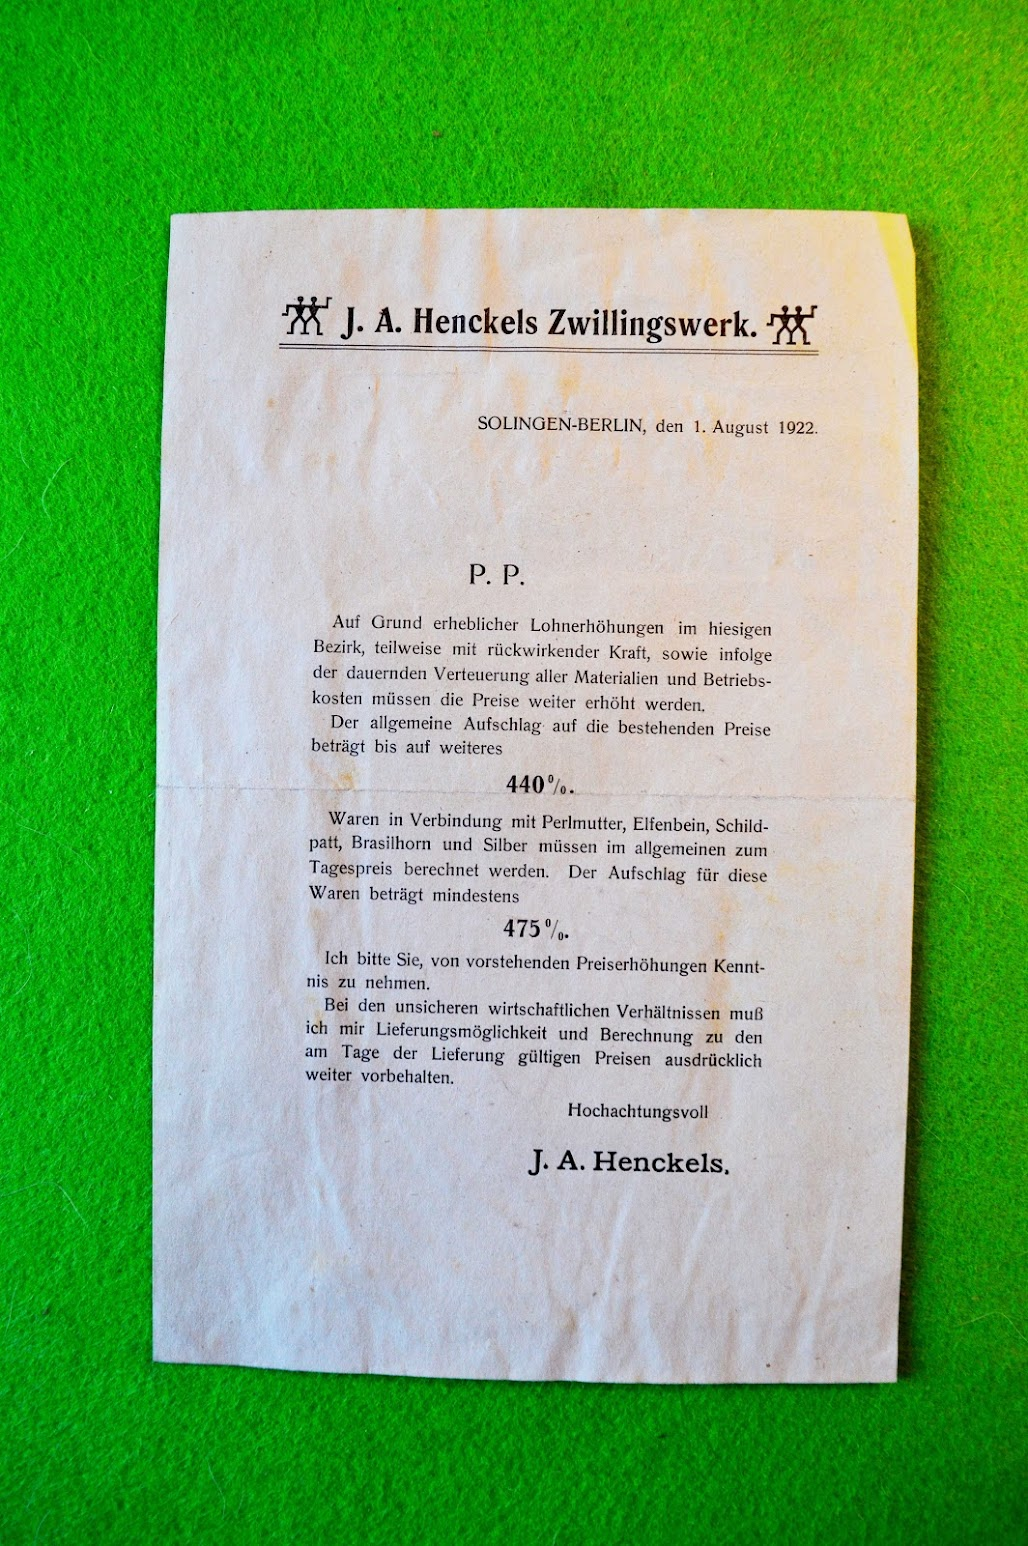 Inflation 1922 - Preisanpassung - J. A. Henckels Zwillingswerk